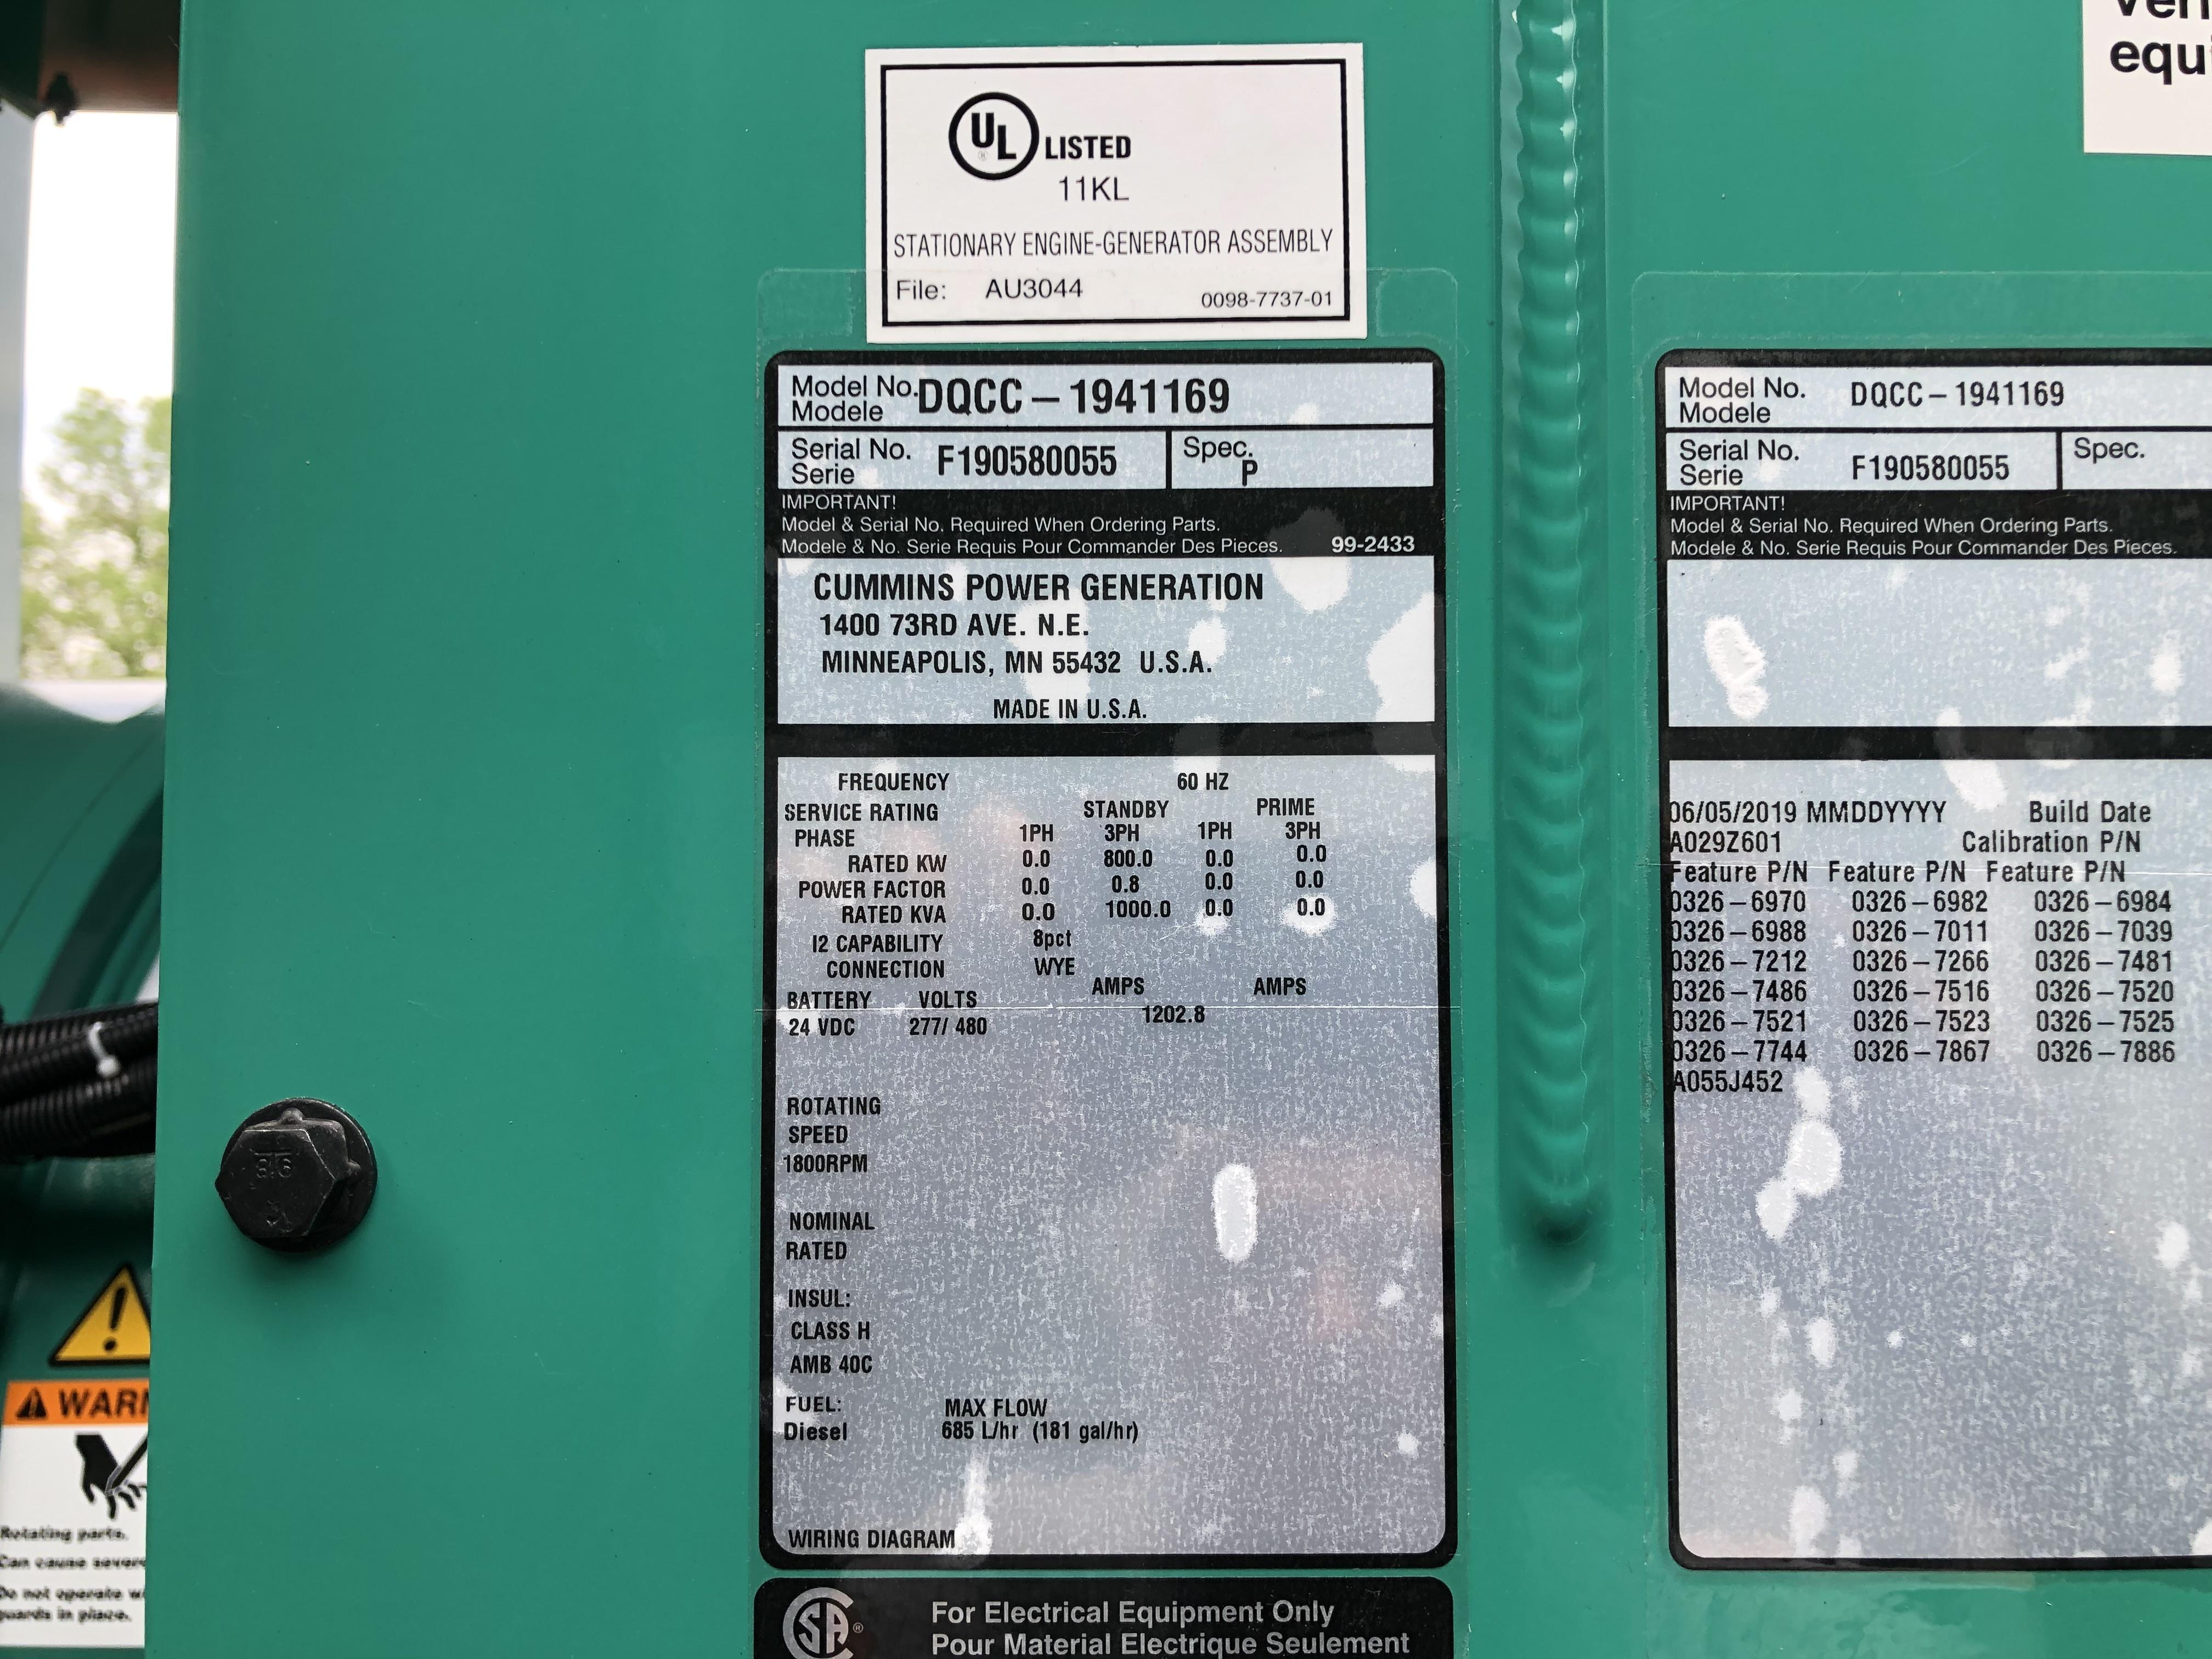 New Cummins DQCC QSK23-G7 NR2 Diesel Generator, EPA Tier 2